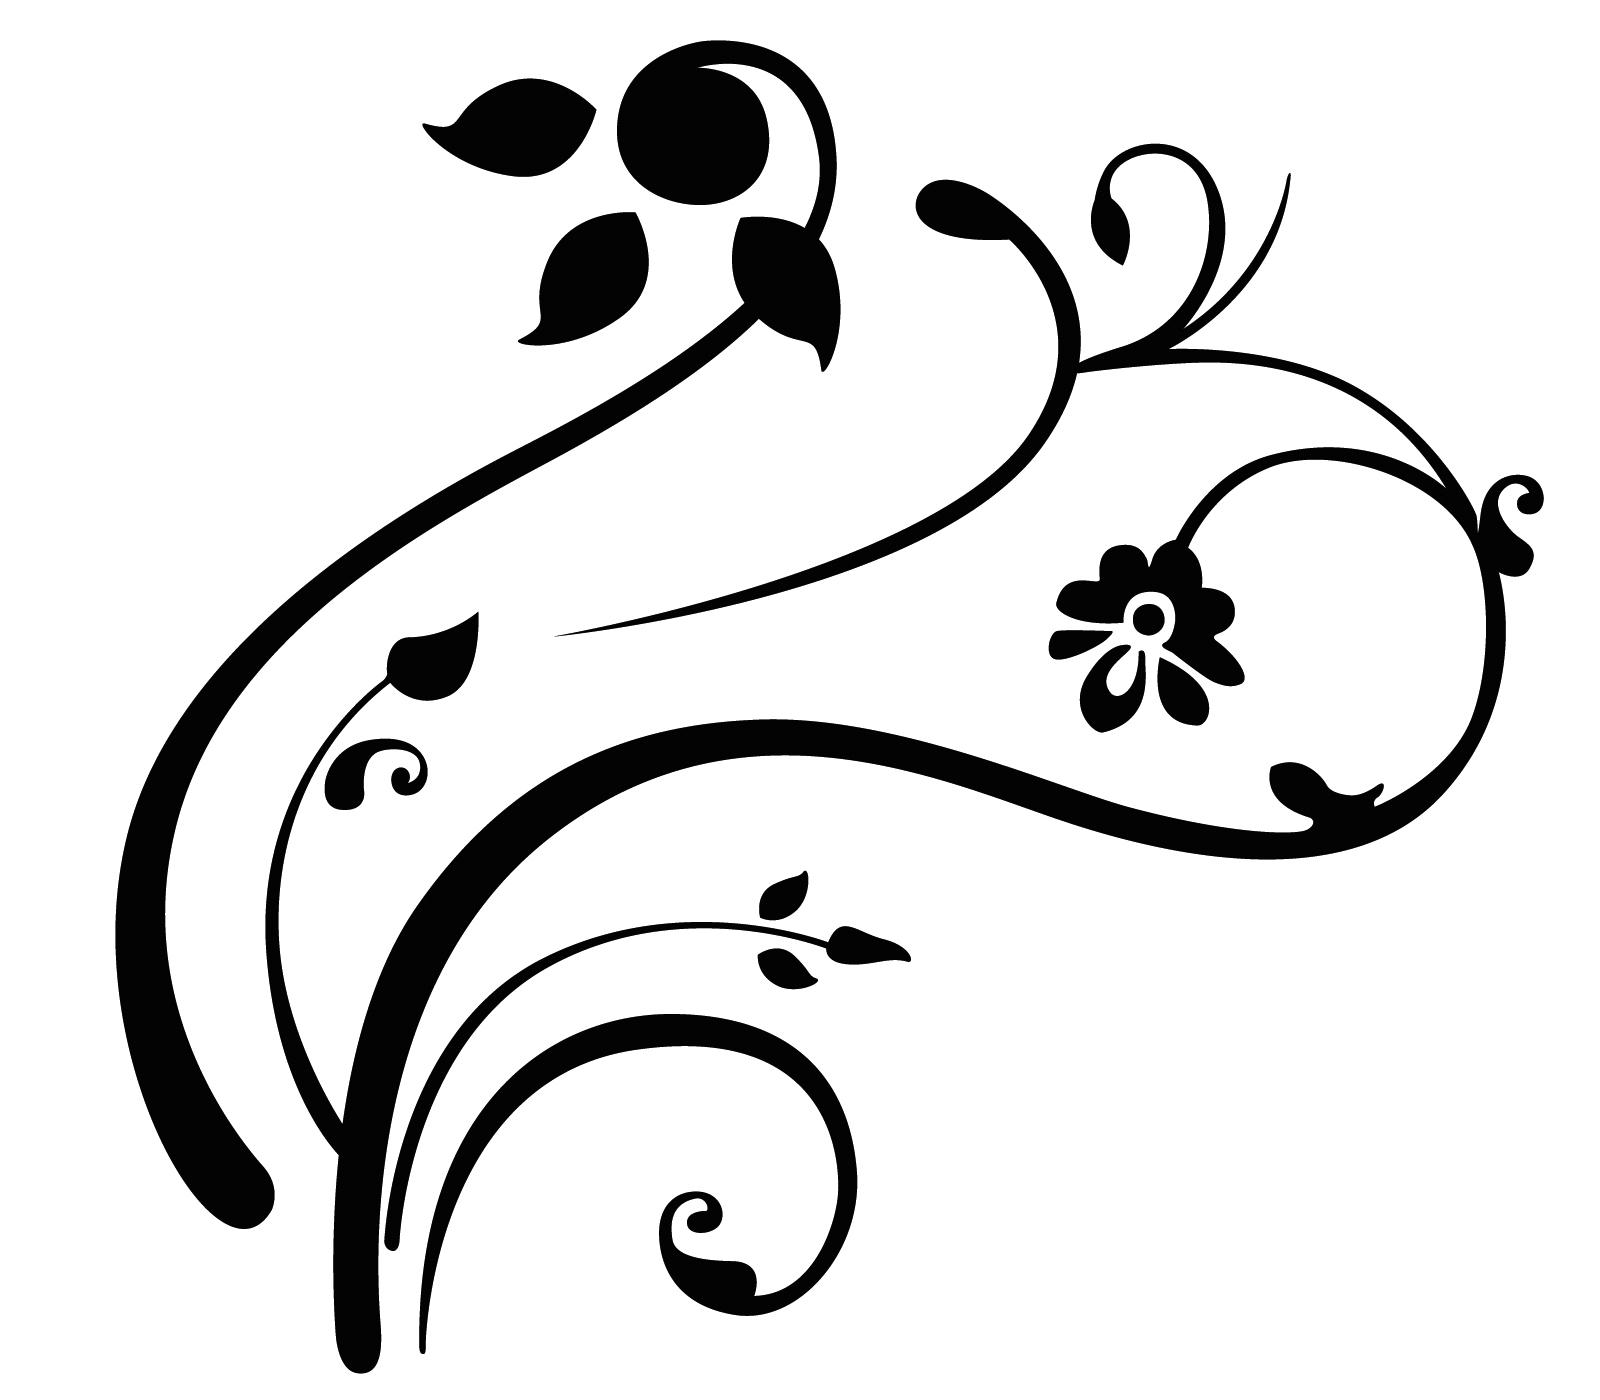 Free Simple Line Art Designs Swirls